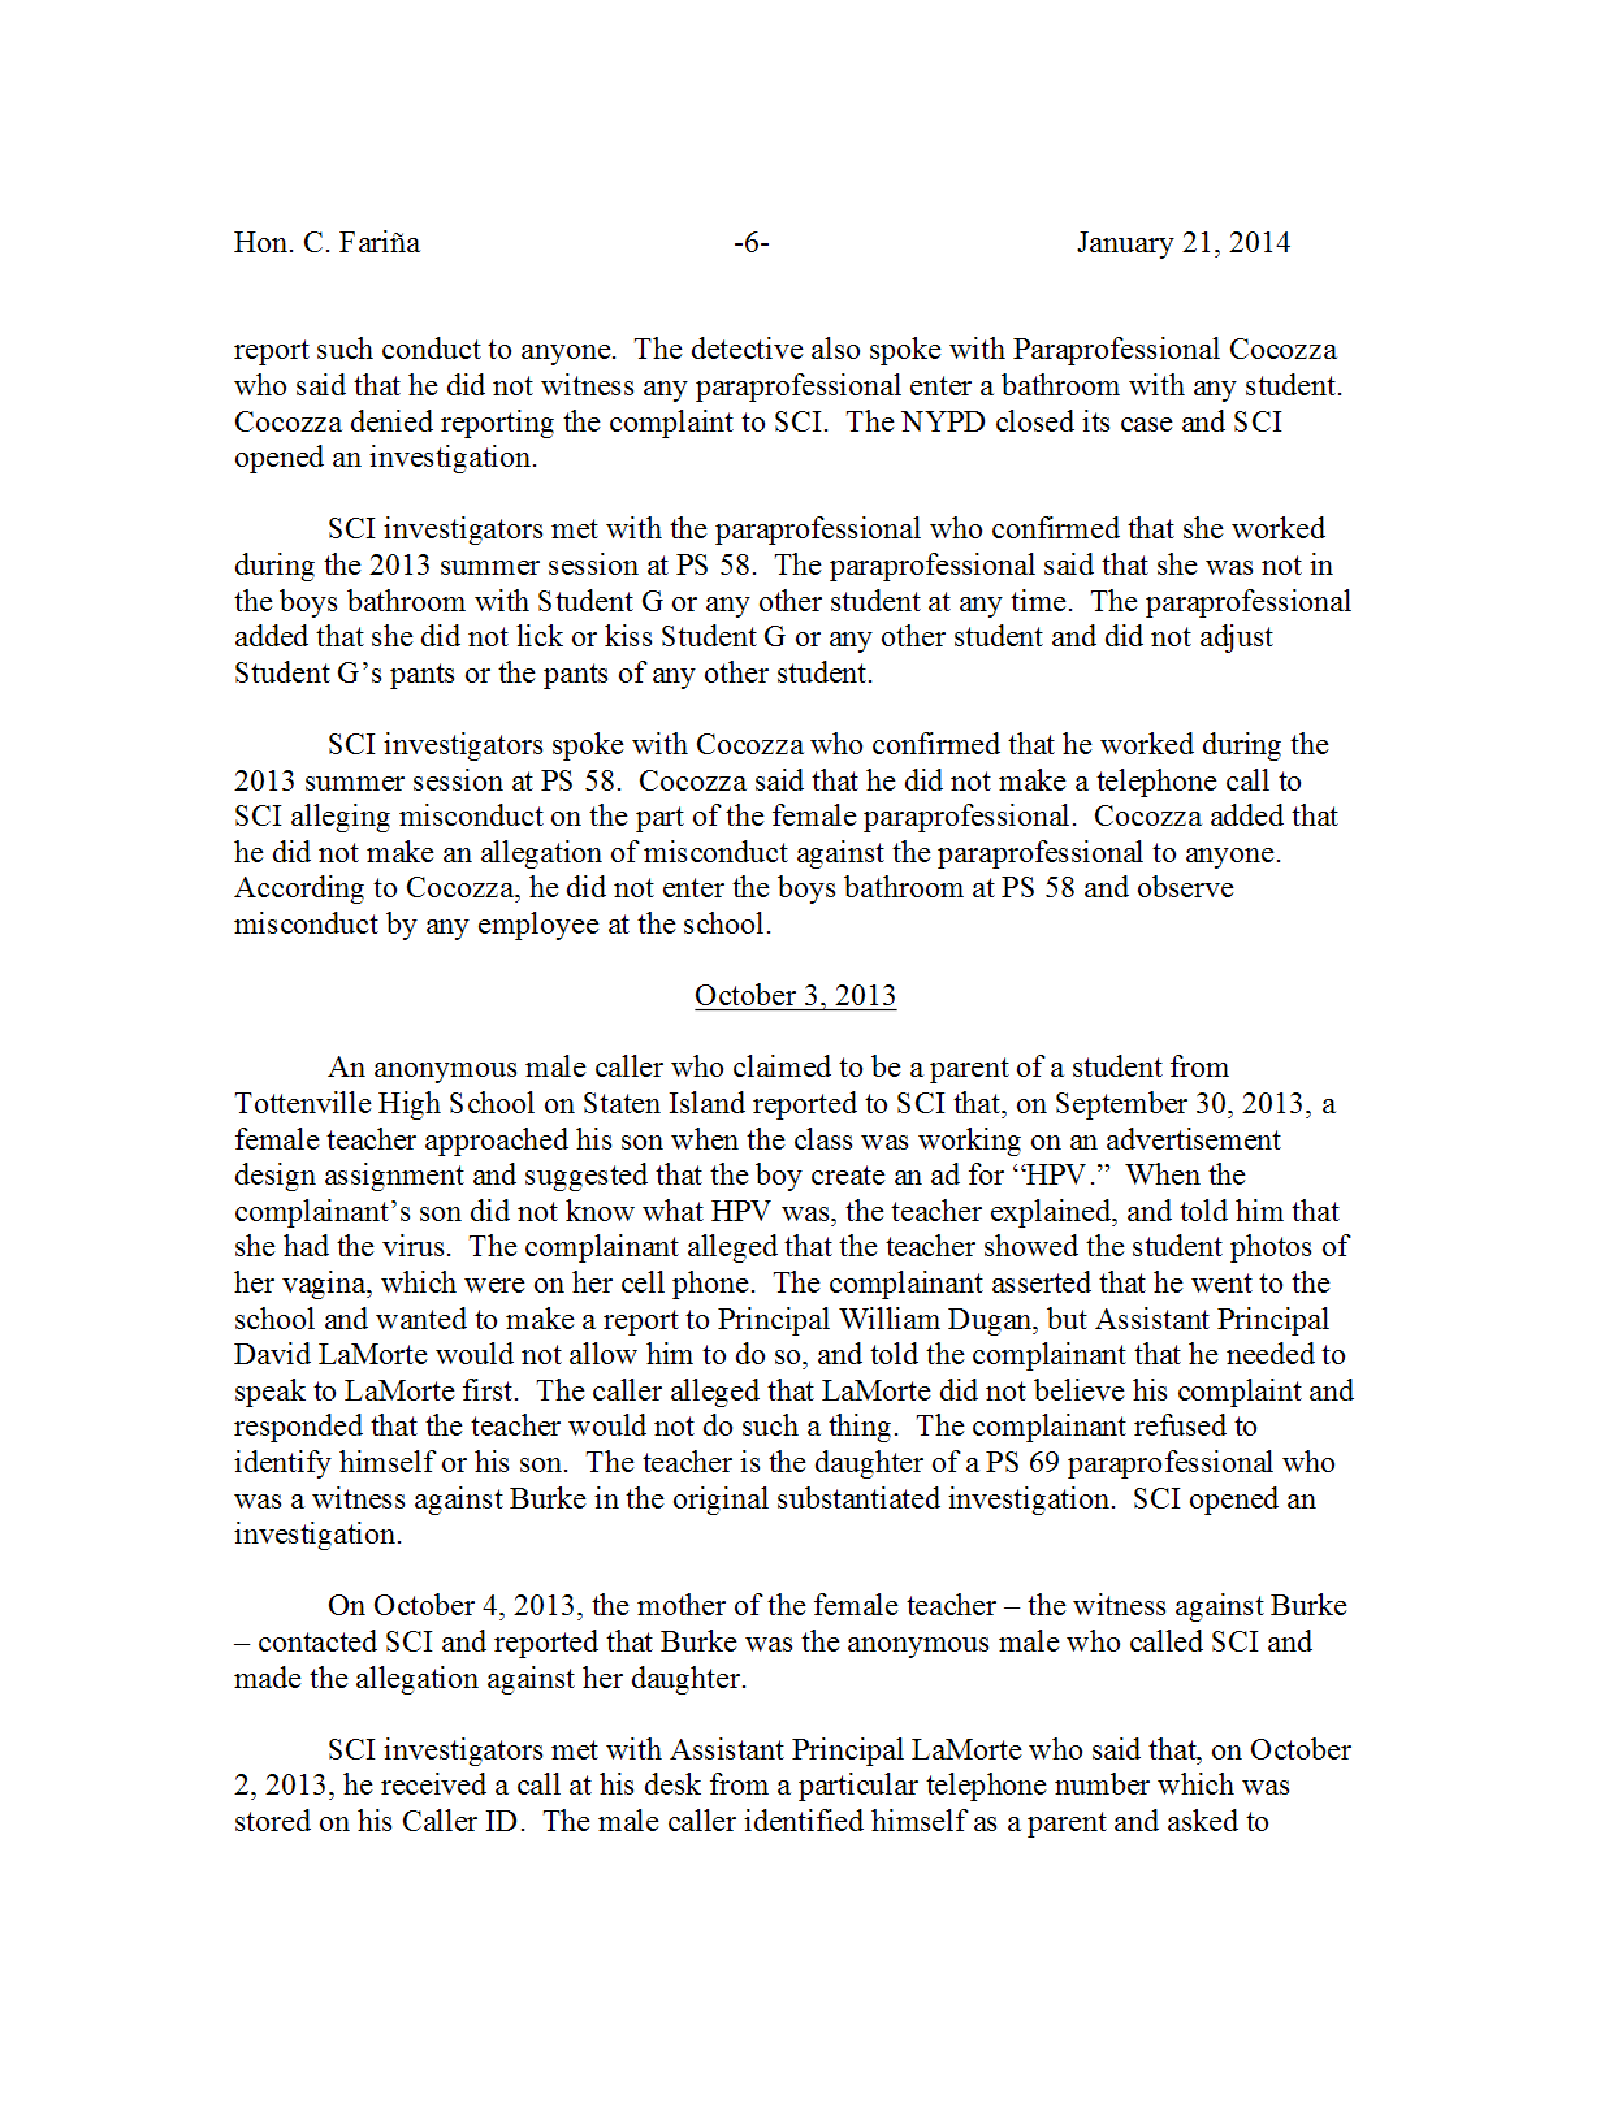 Copy of 1-22-2014 9-25-02 AM06.png